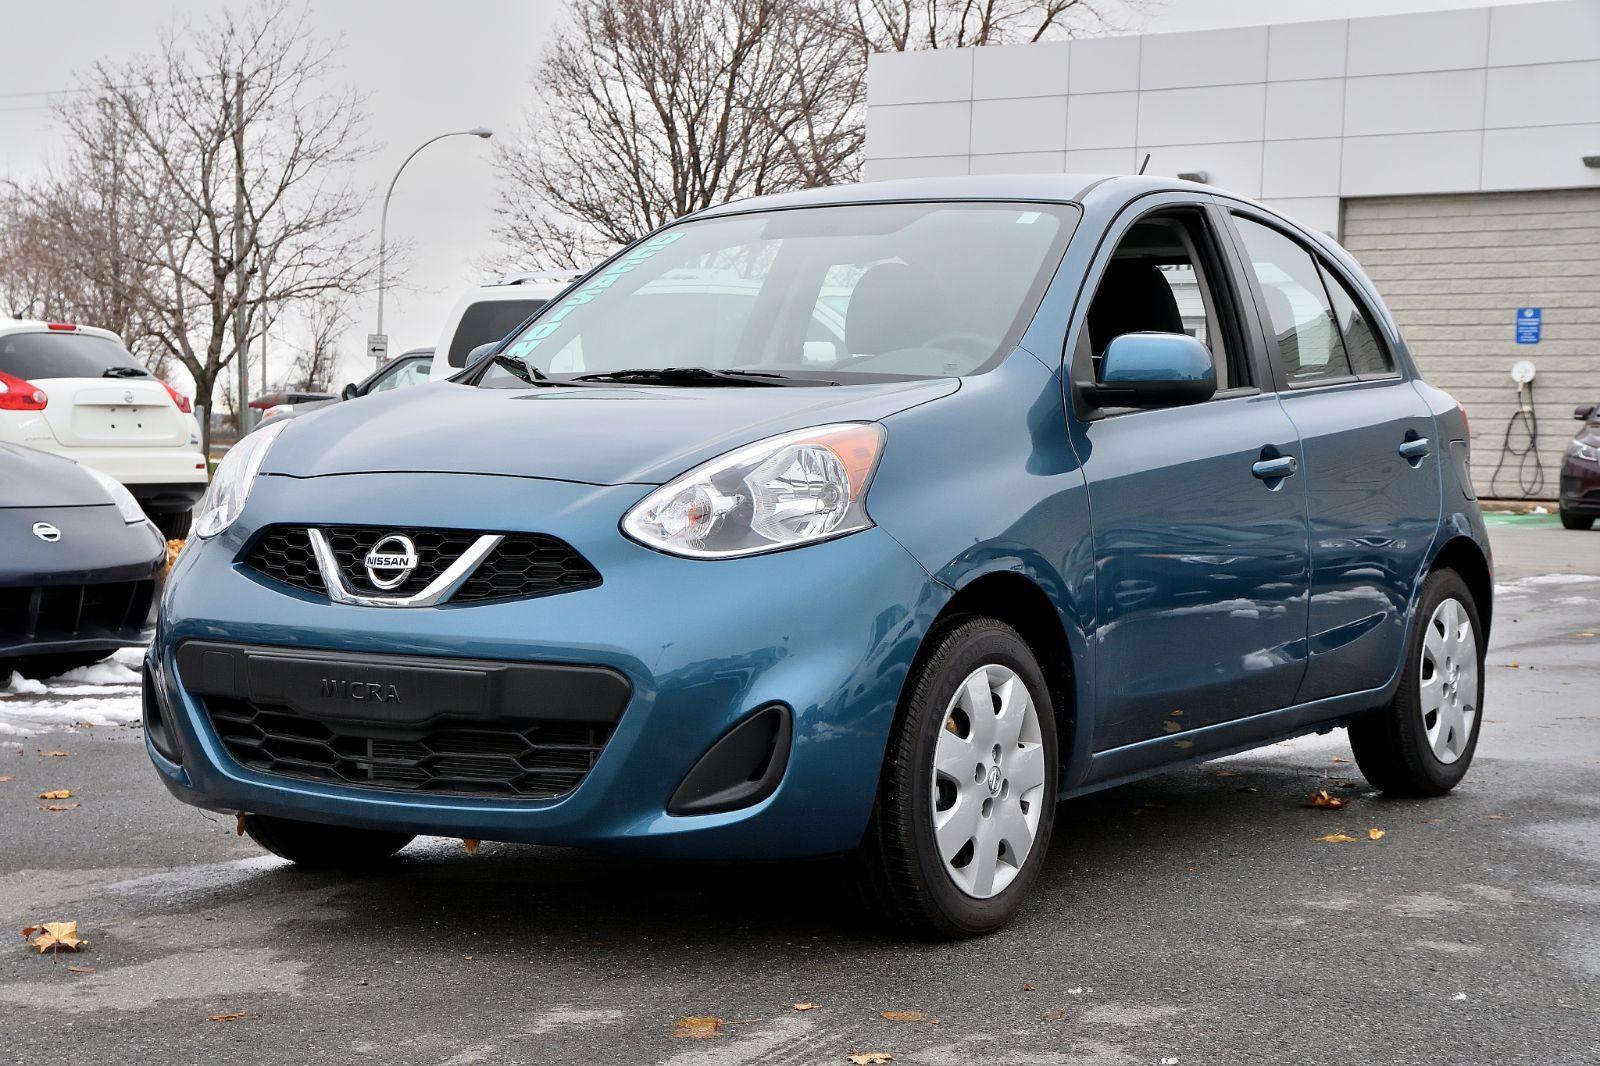 Nissan Of St Charles >> 2018 Nissan Micra *SV*AUTOM*A/C*BLEUE*440KM*DEMARREUR* d'occasion à Longueuil - Inventaire d ...